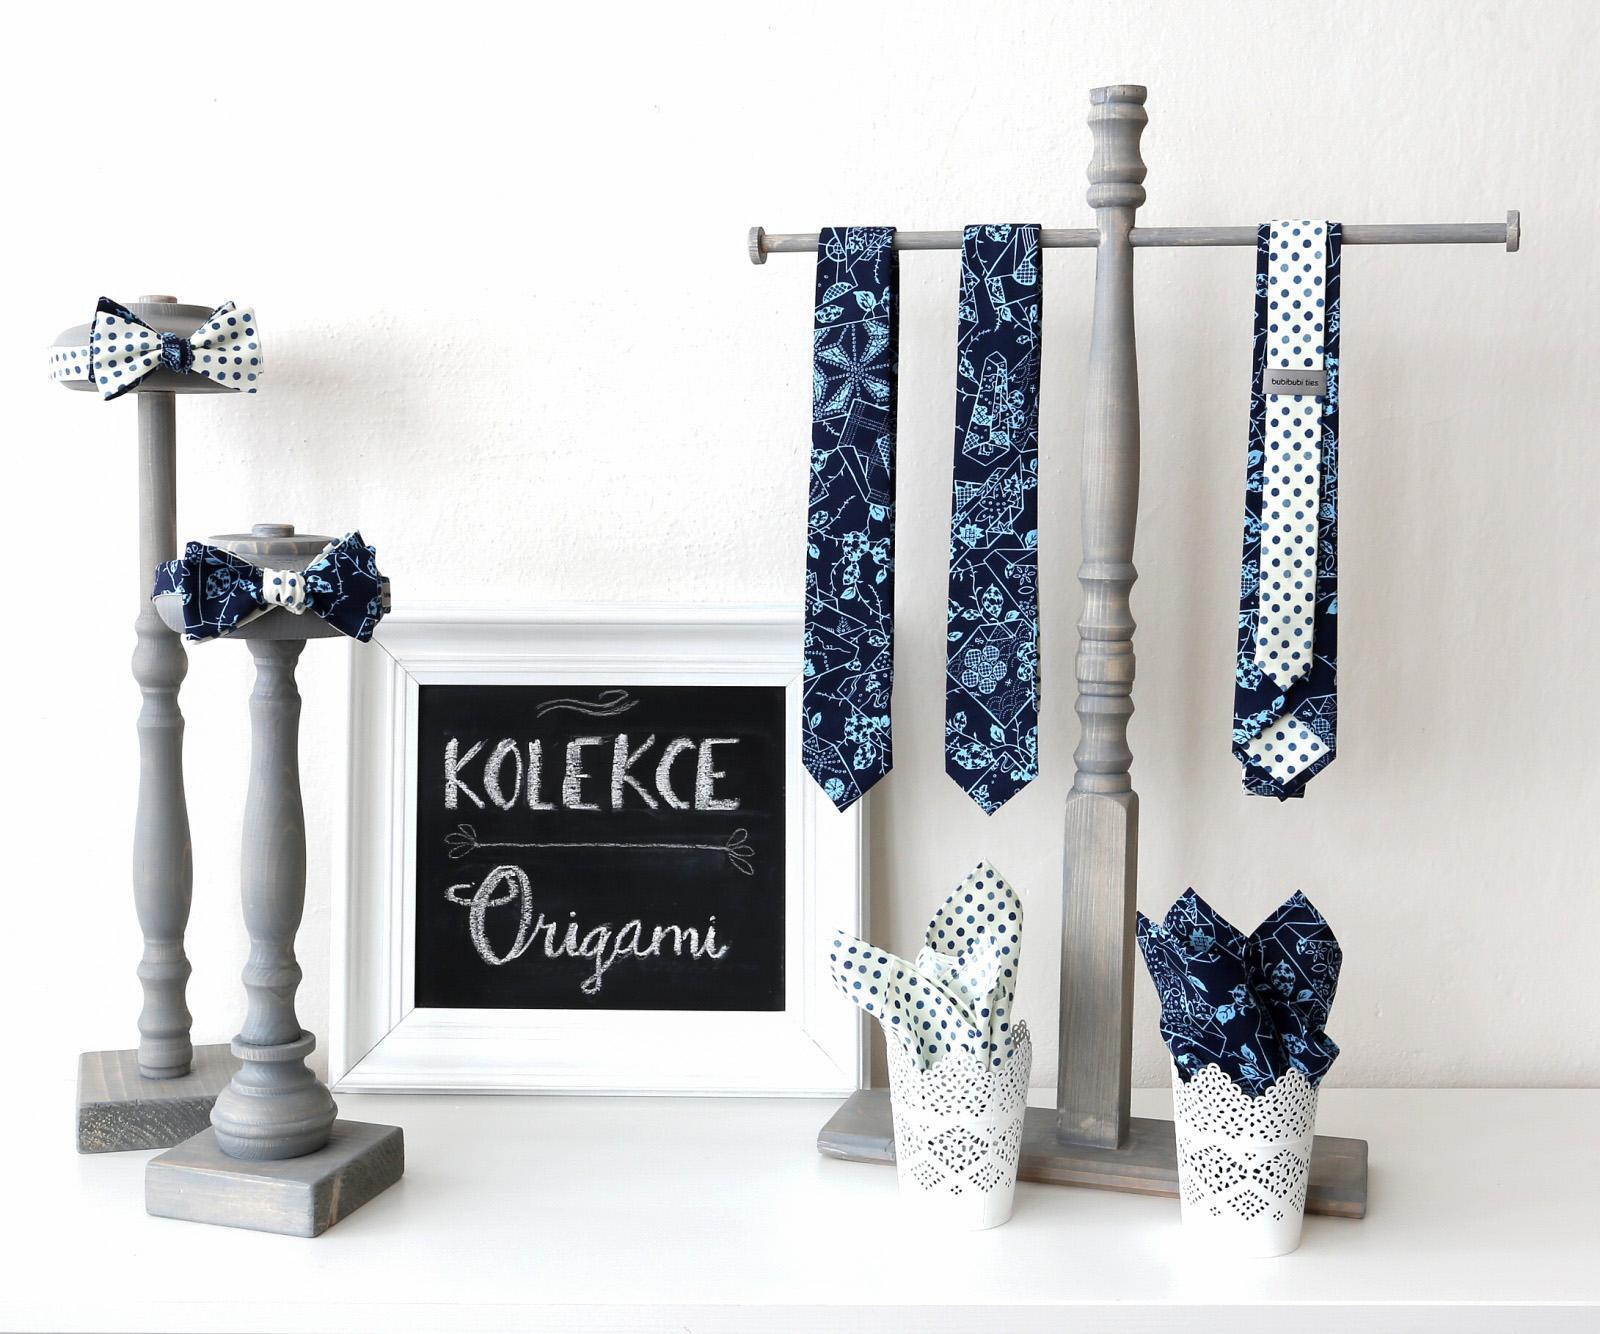 bubibubi_ties - Kolekce kravat a motýlků Origami.